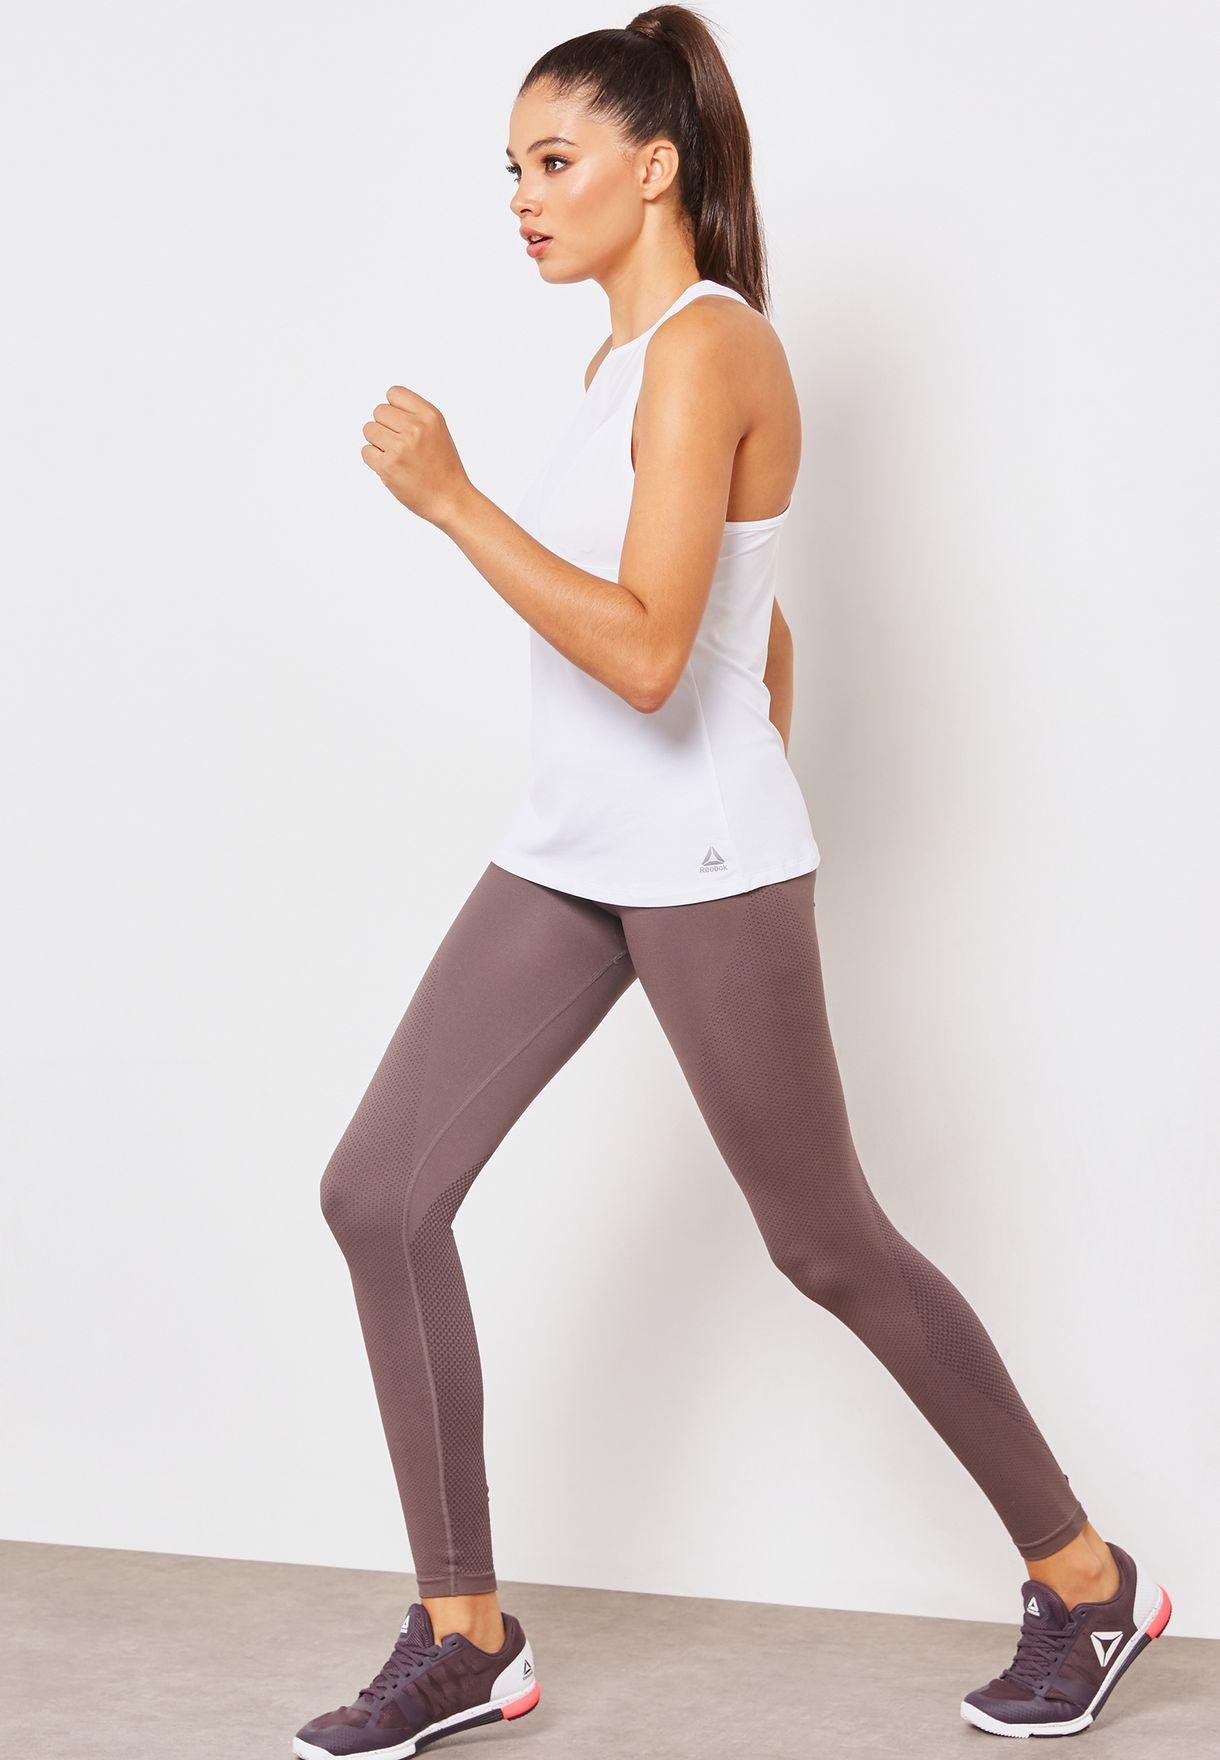 Workout Ready Seamless Leggings